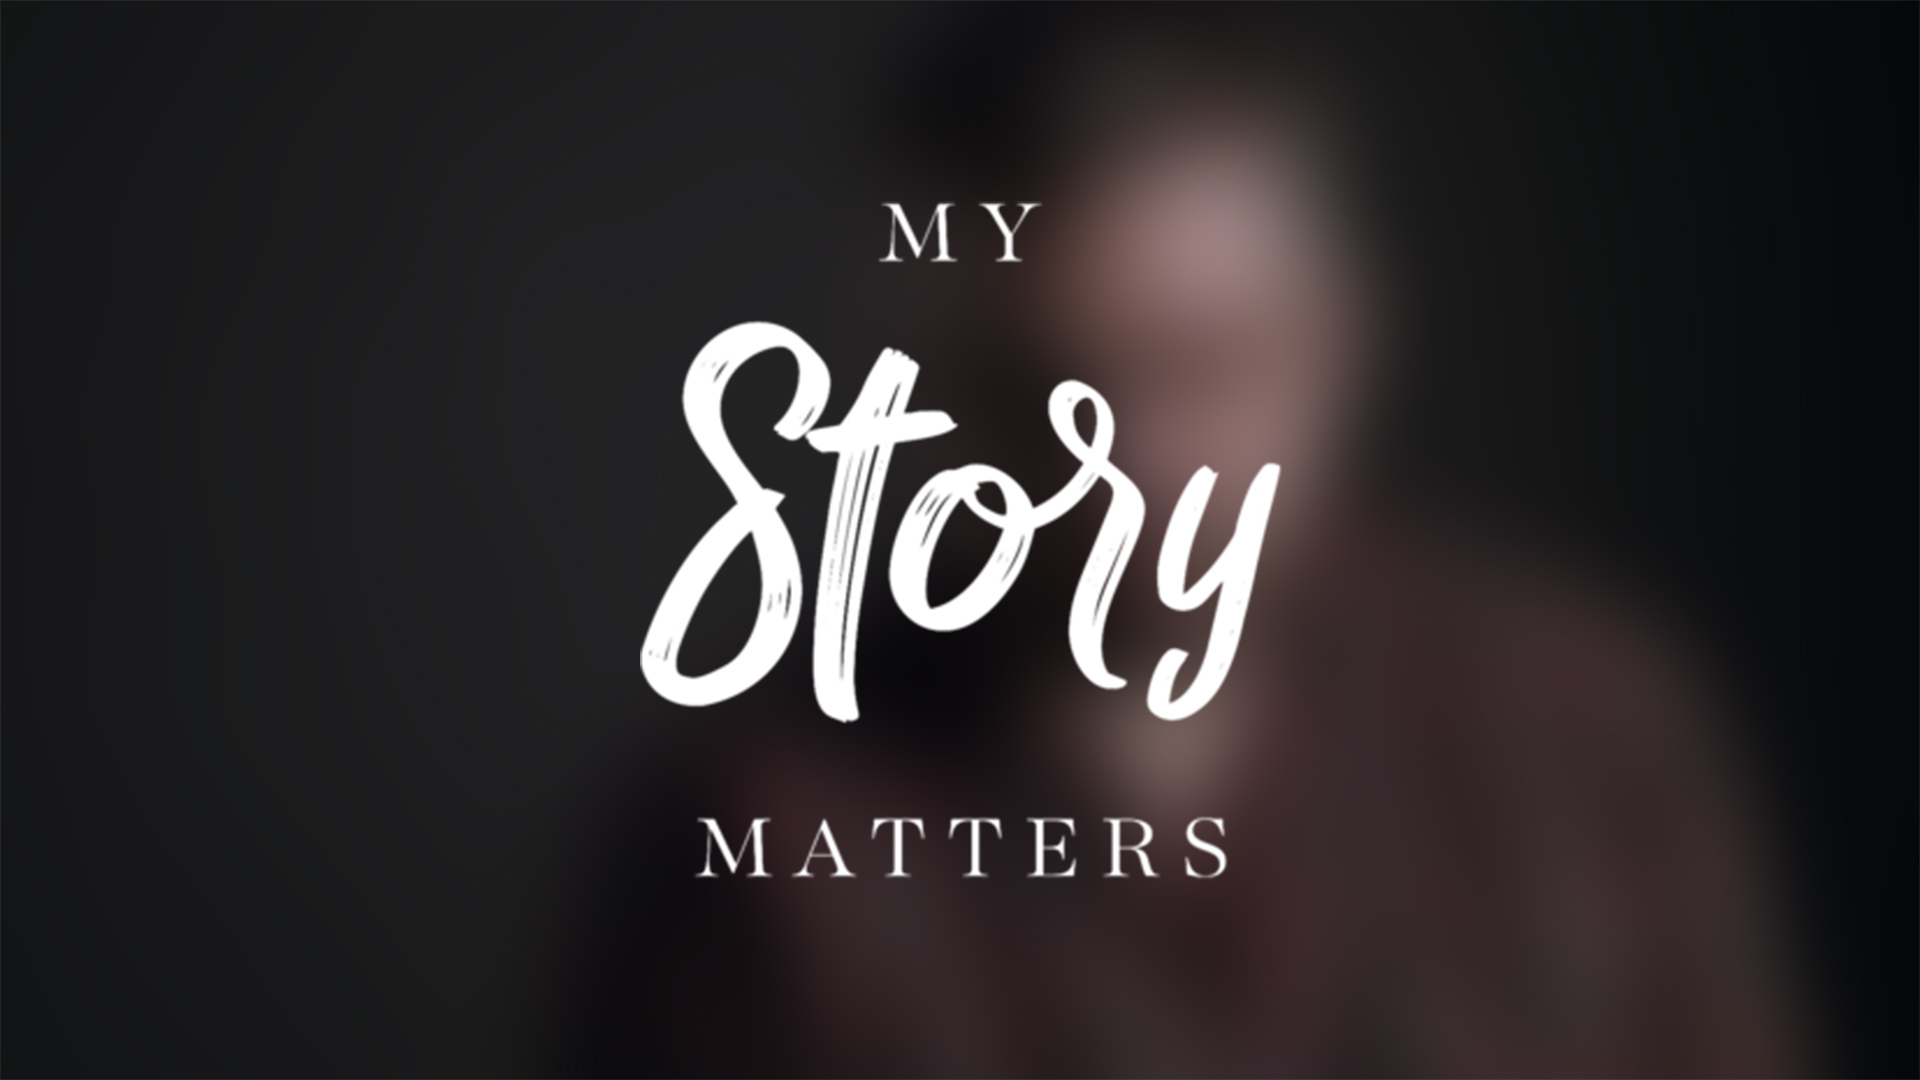 My-Story-Matters-Roger-Thumb.jpg